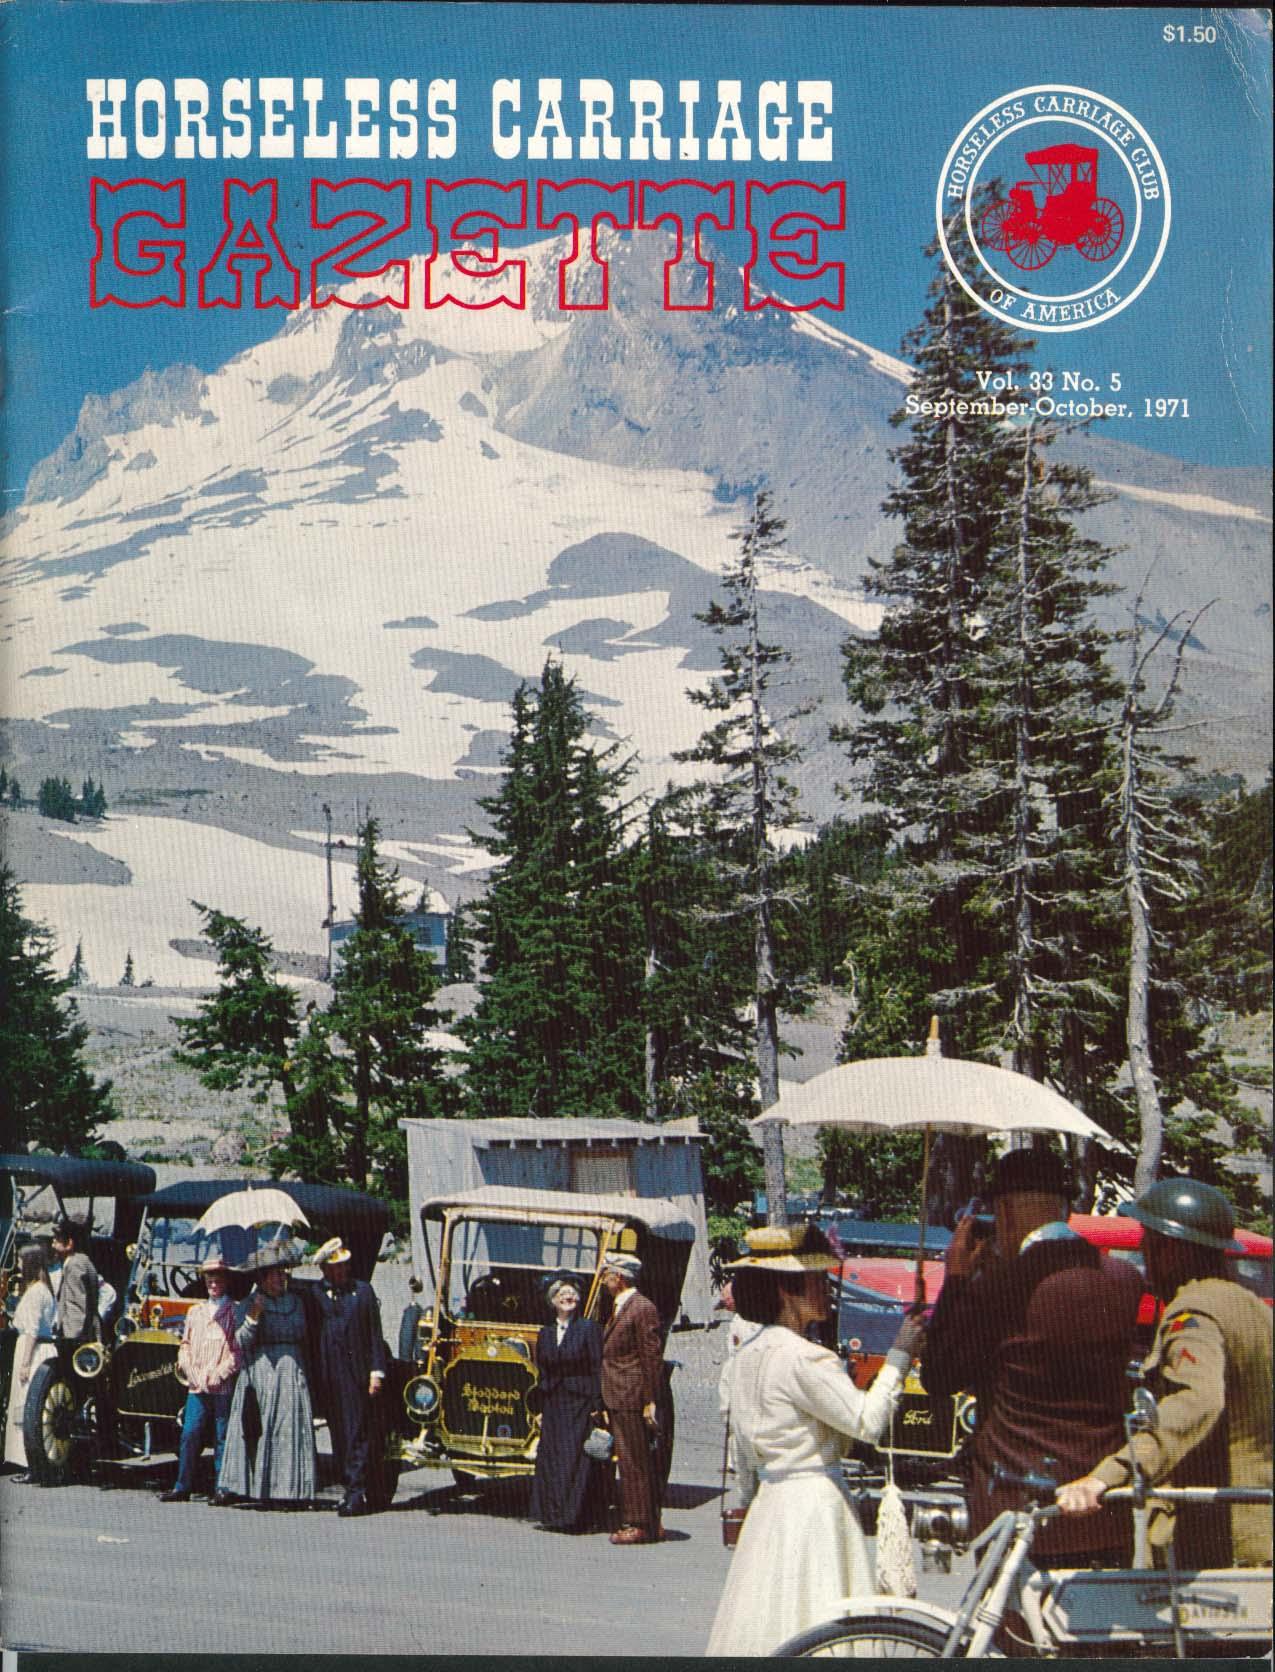 HORSELESS CARRIAGE GAZETTE La Jolla Tour 1905 Mercedes Sunbeam 9/10 1971